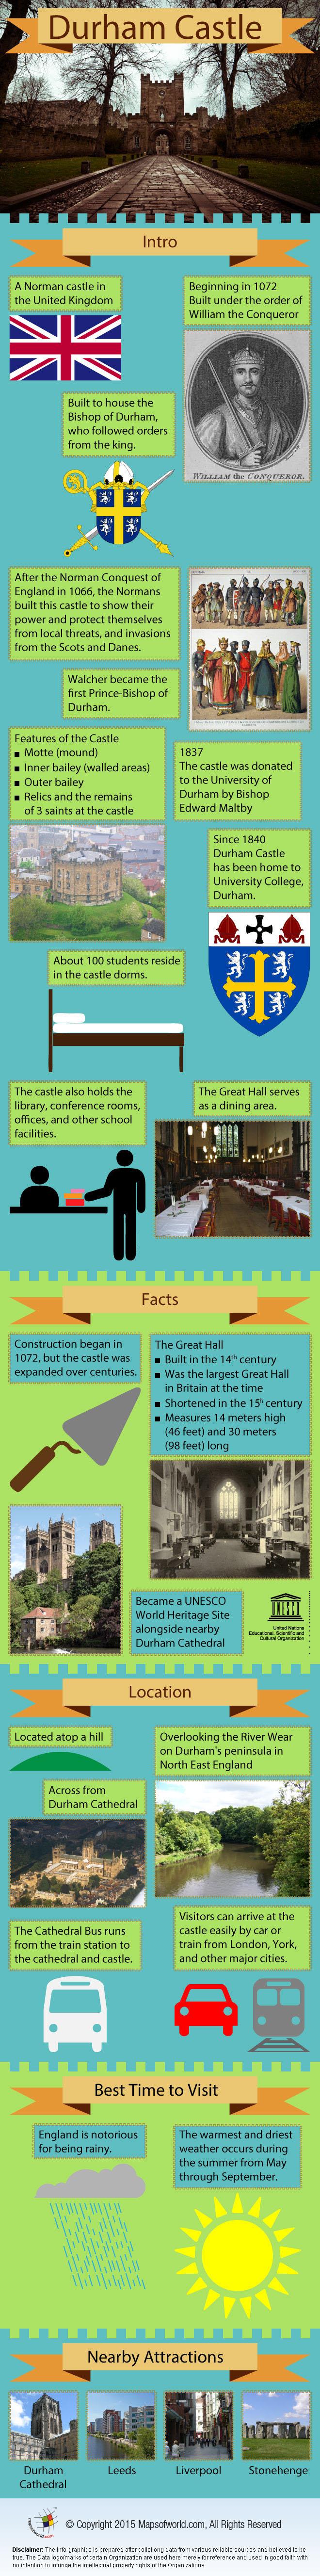 Durham Castle Infographic